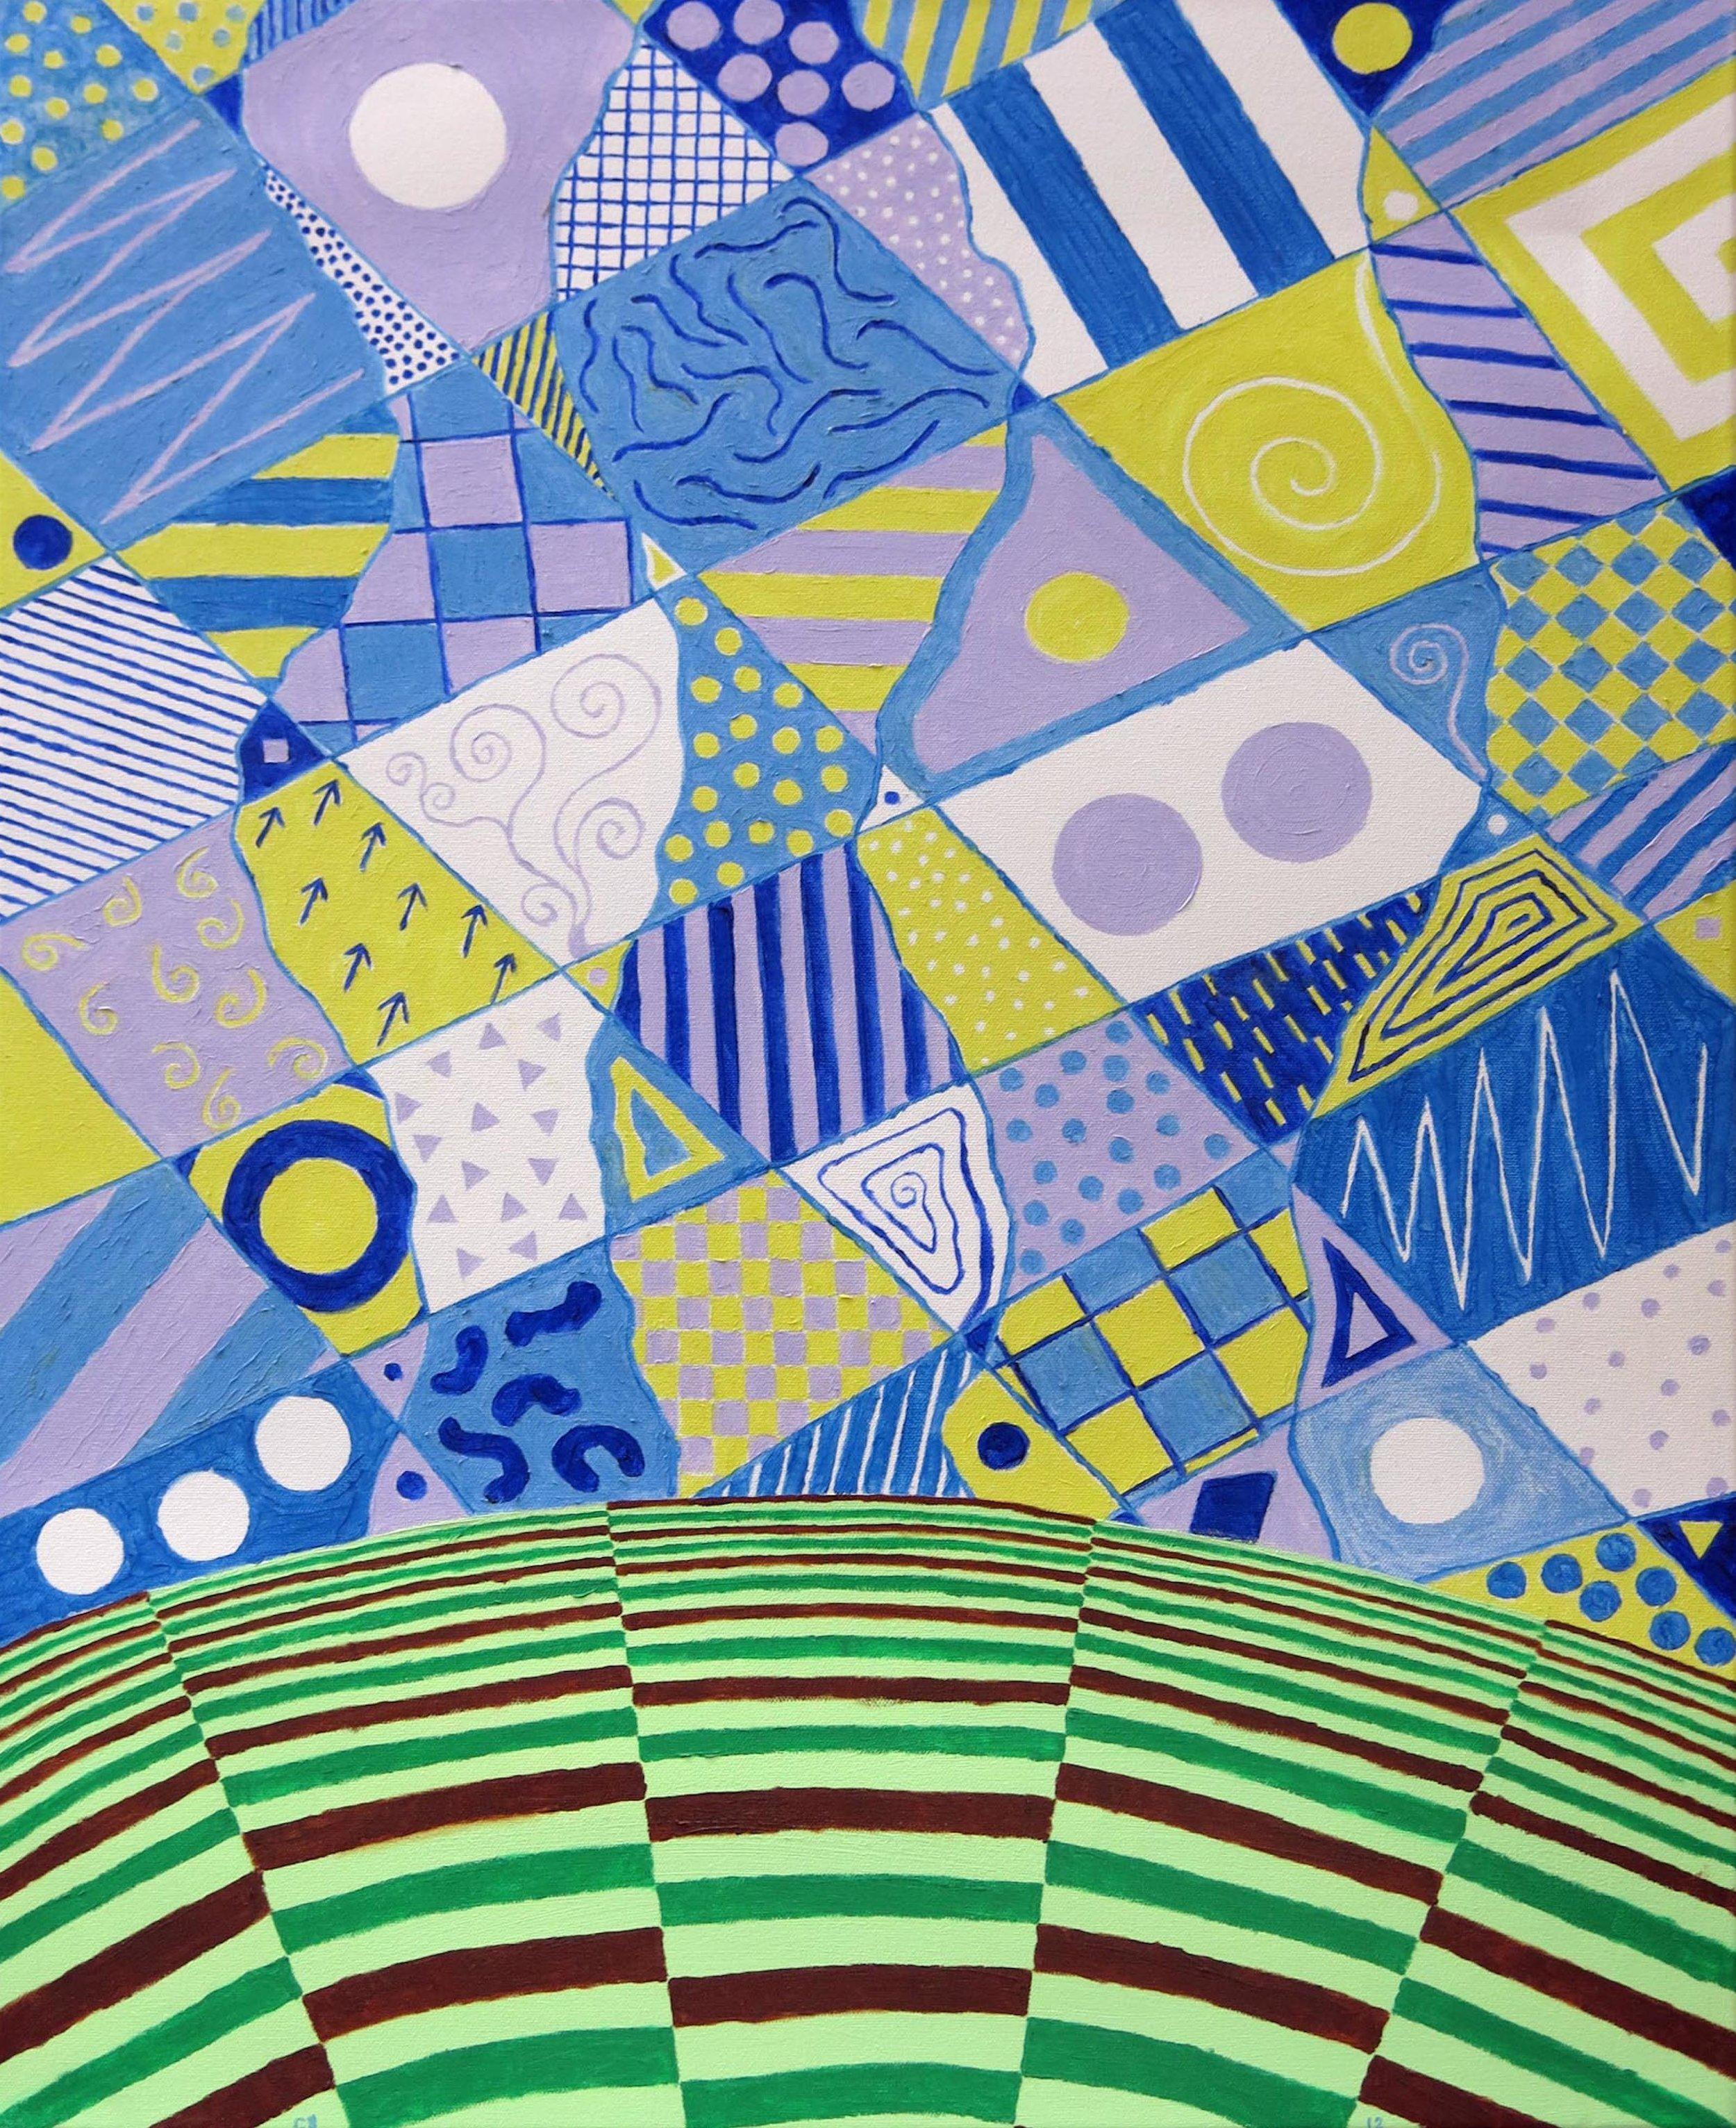 Cuck Boyce,  Calico Sky,  2012, oil on canvas, 28h x 21 1/4w in.